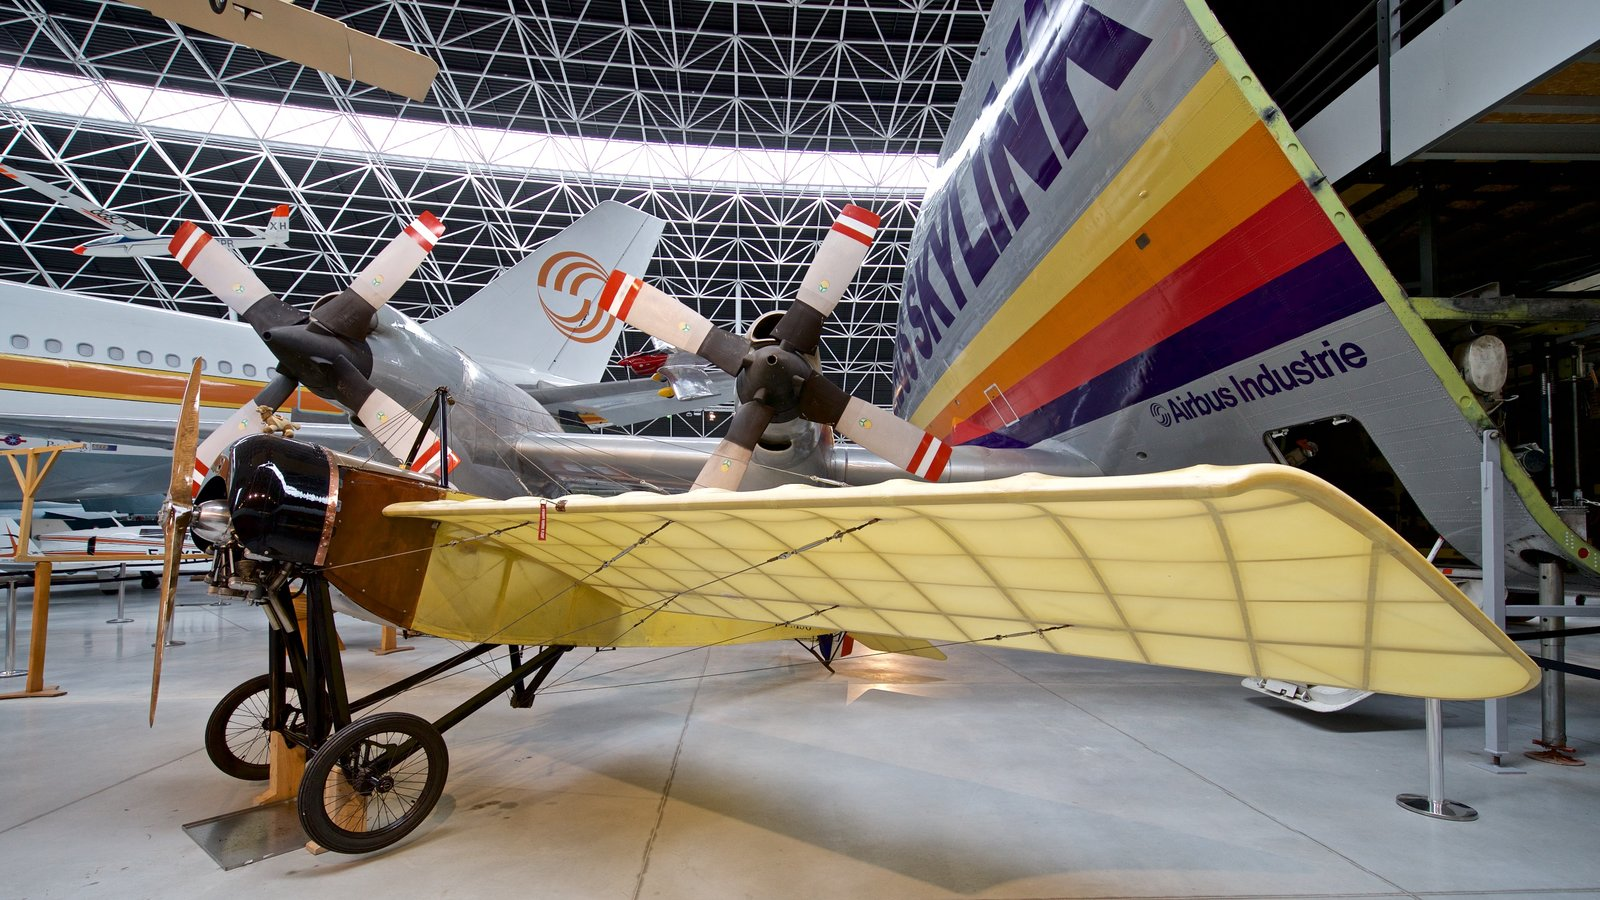 Airbus showing interior views and aircraft